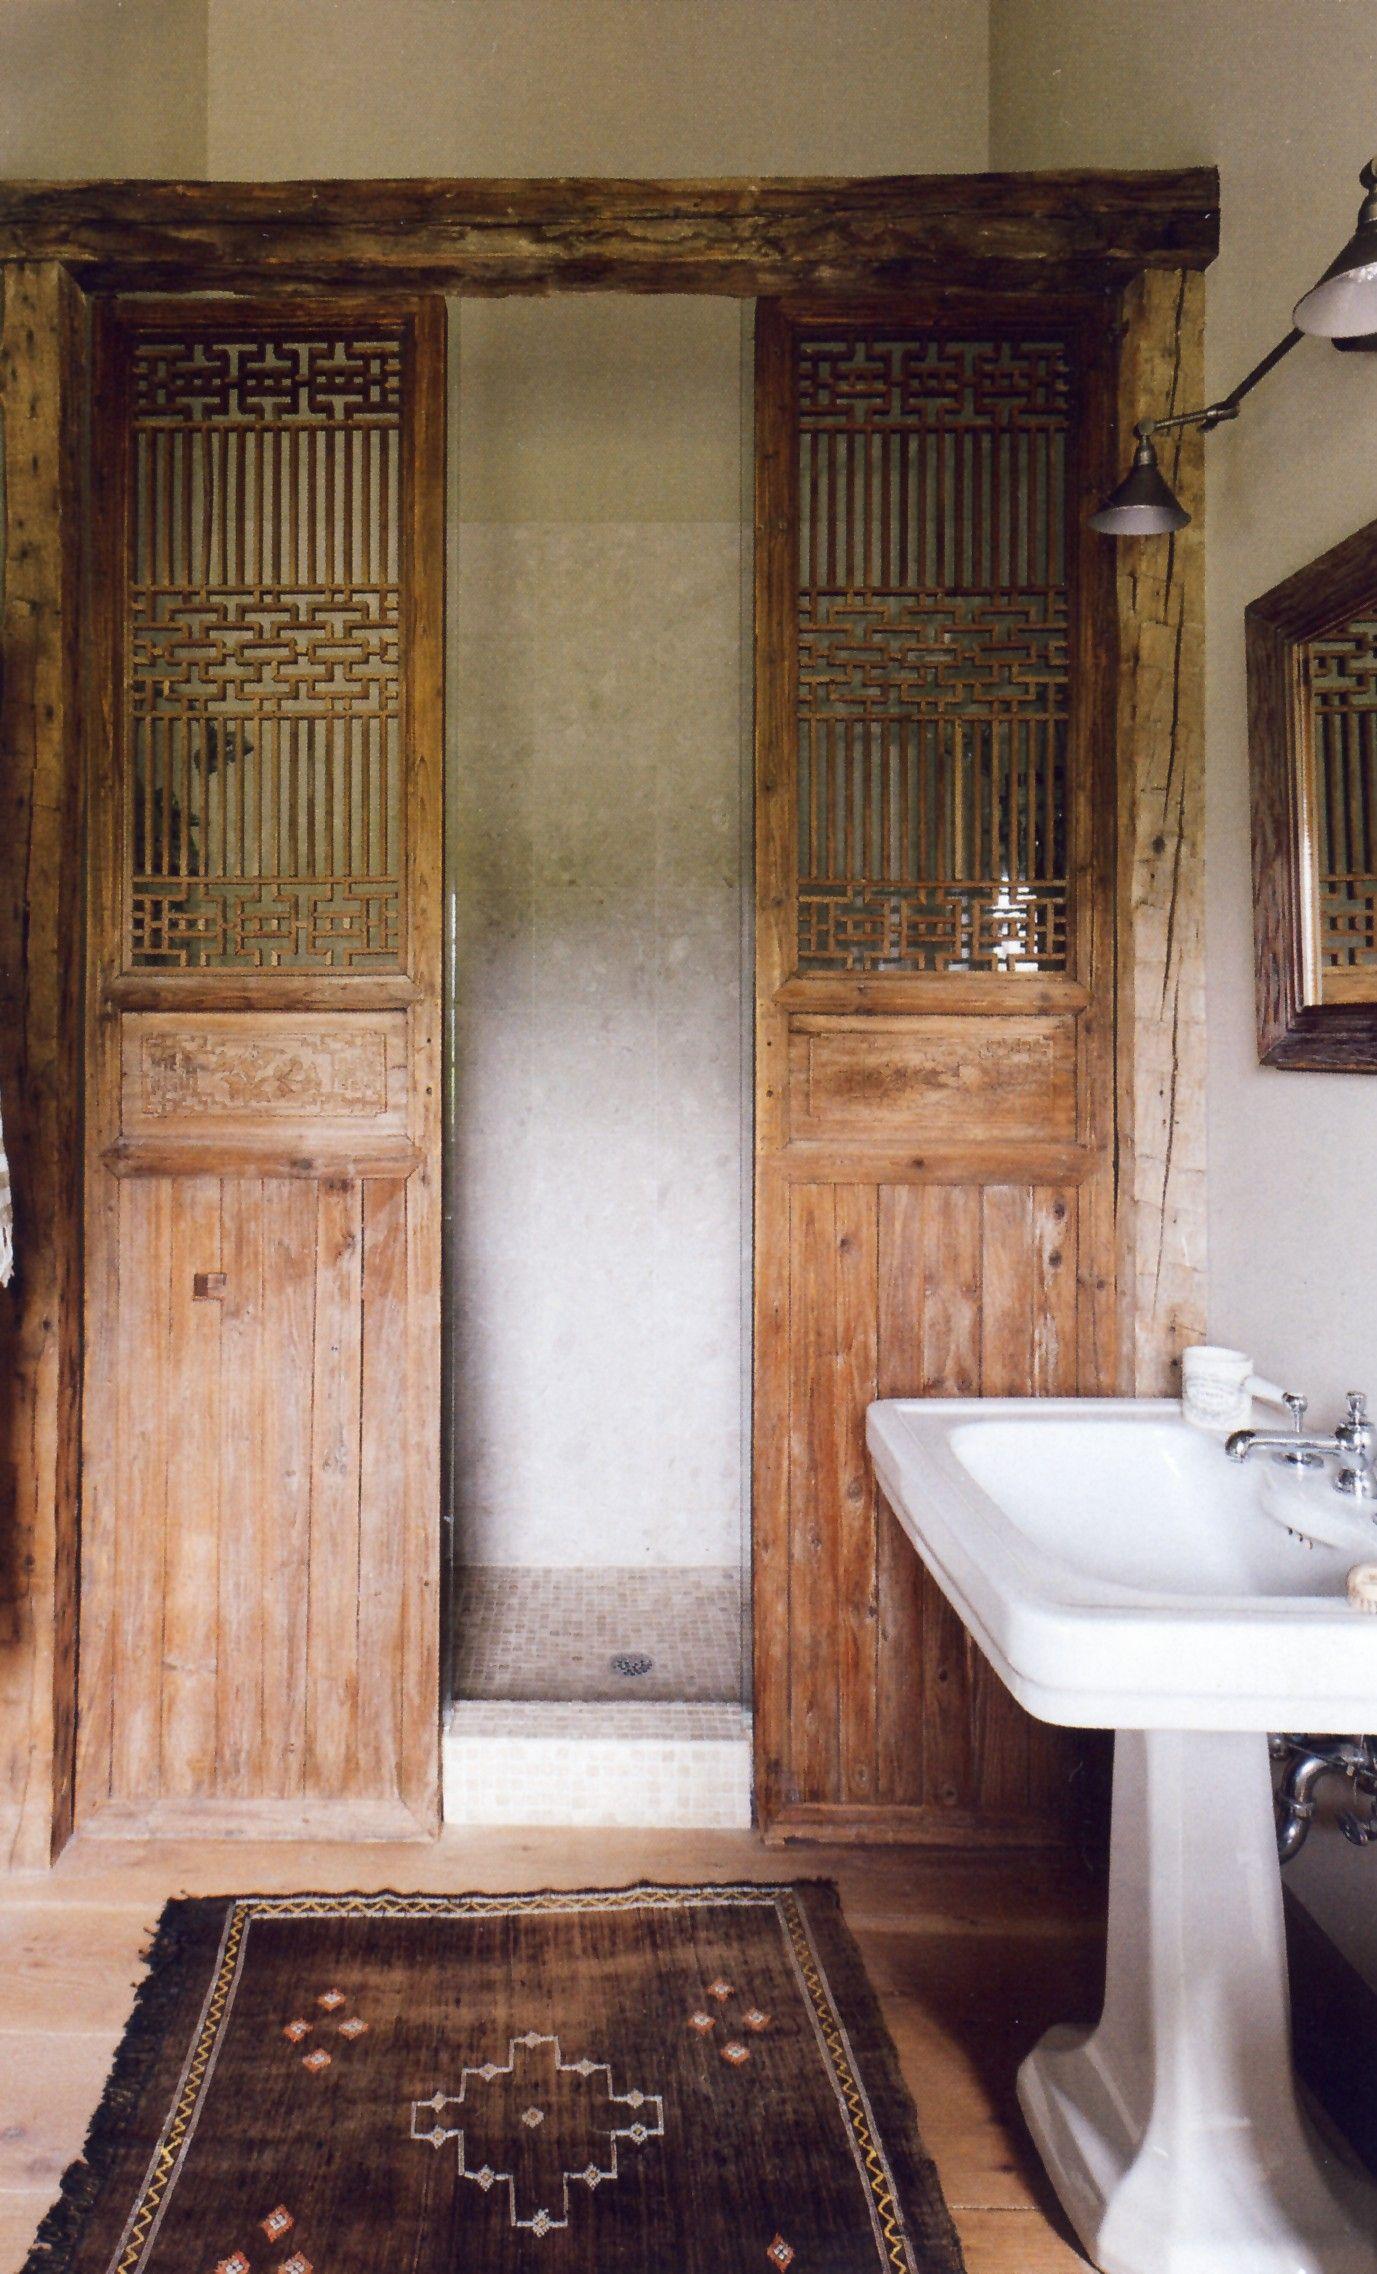 Cool Shower Door Idea We Need Something Like A Tri Fold Tri